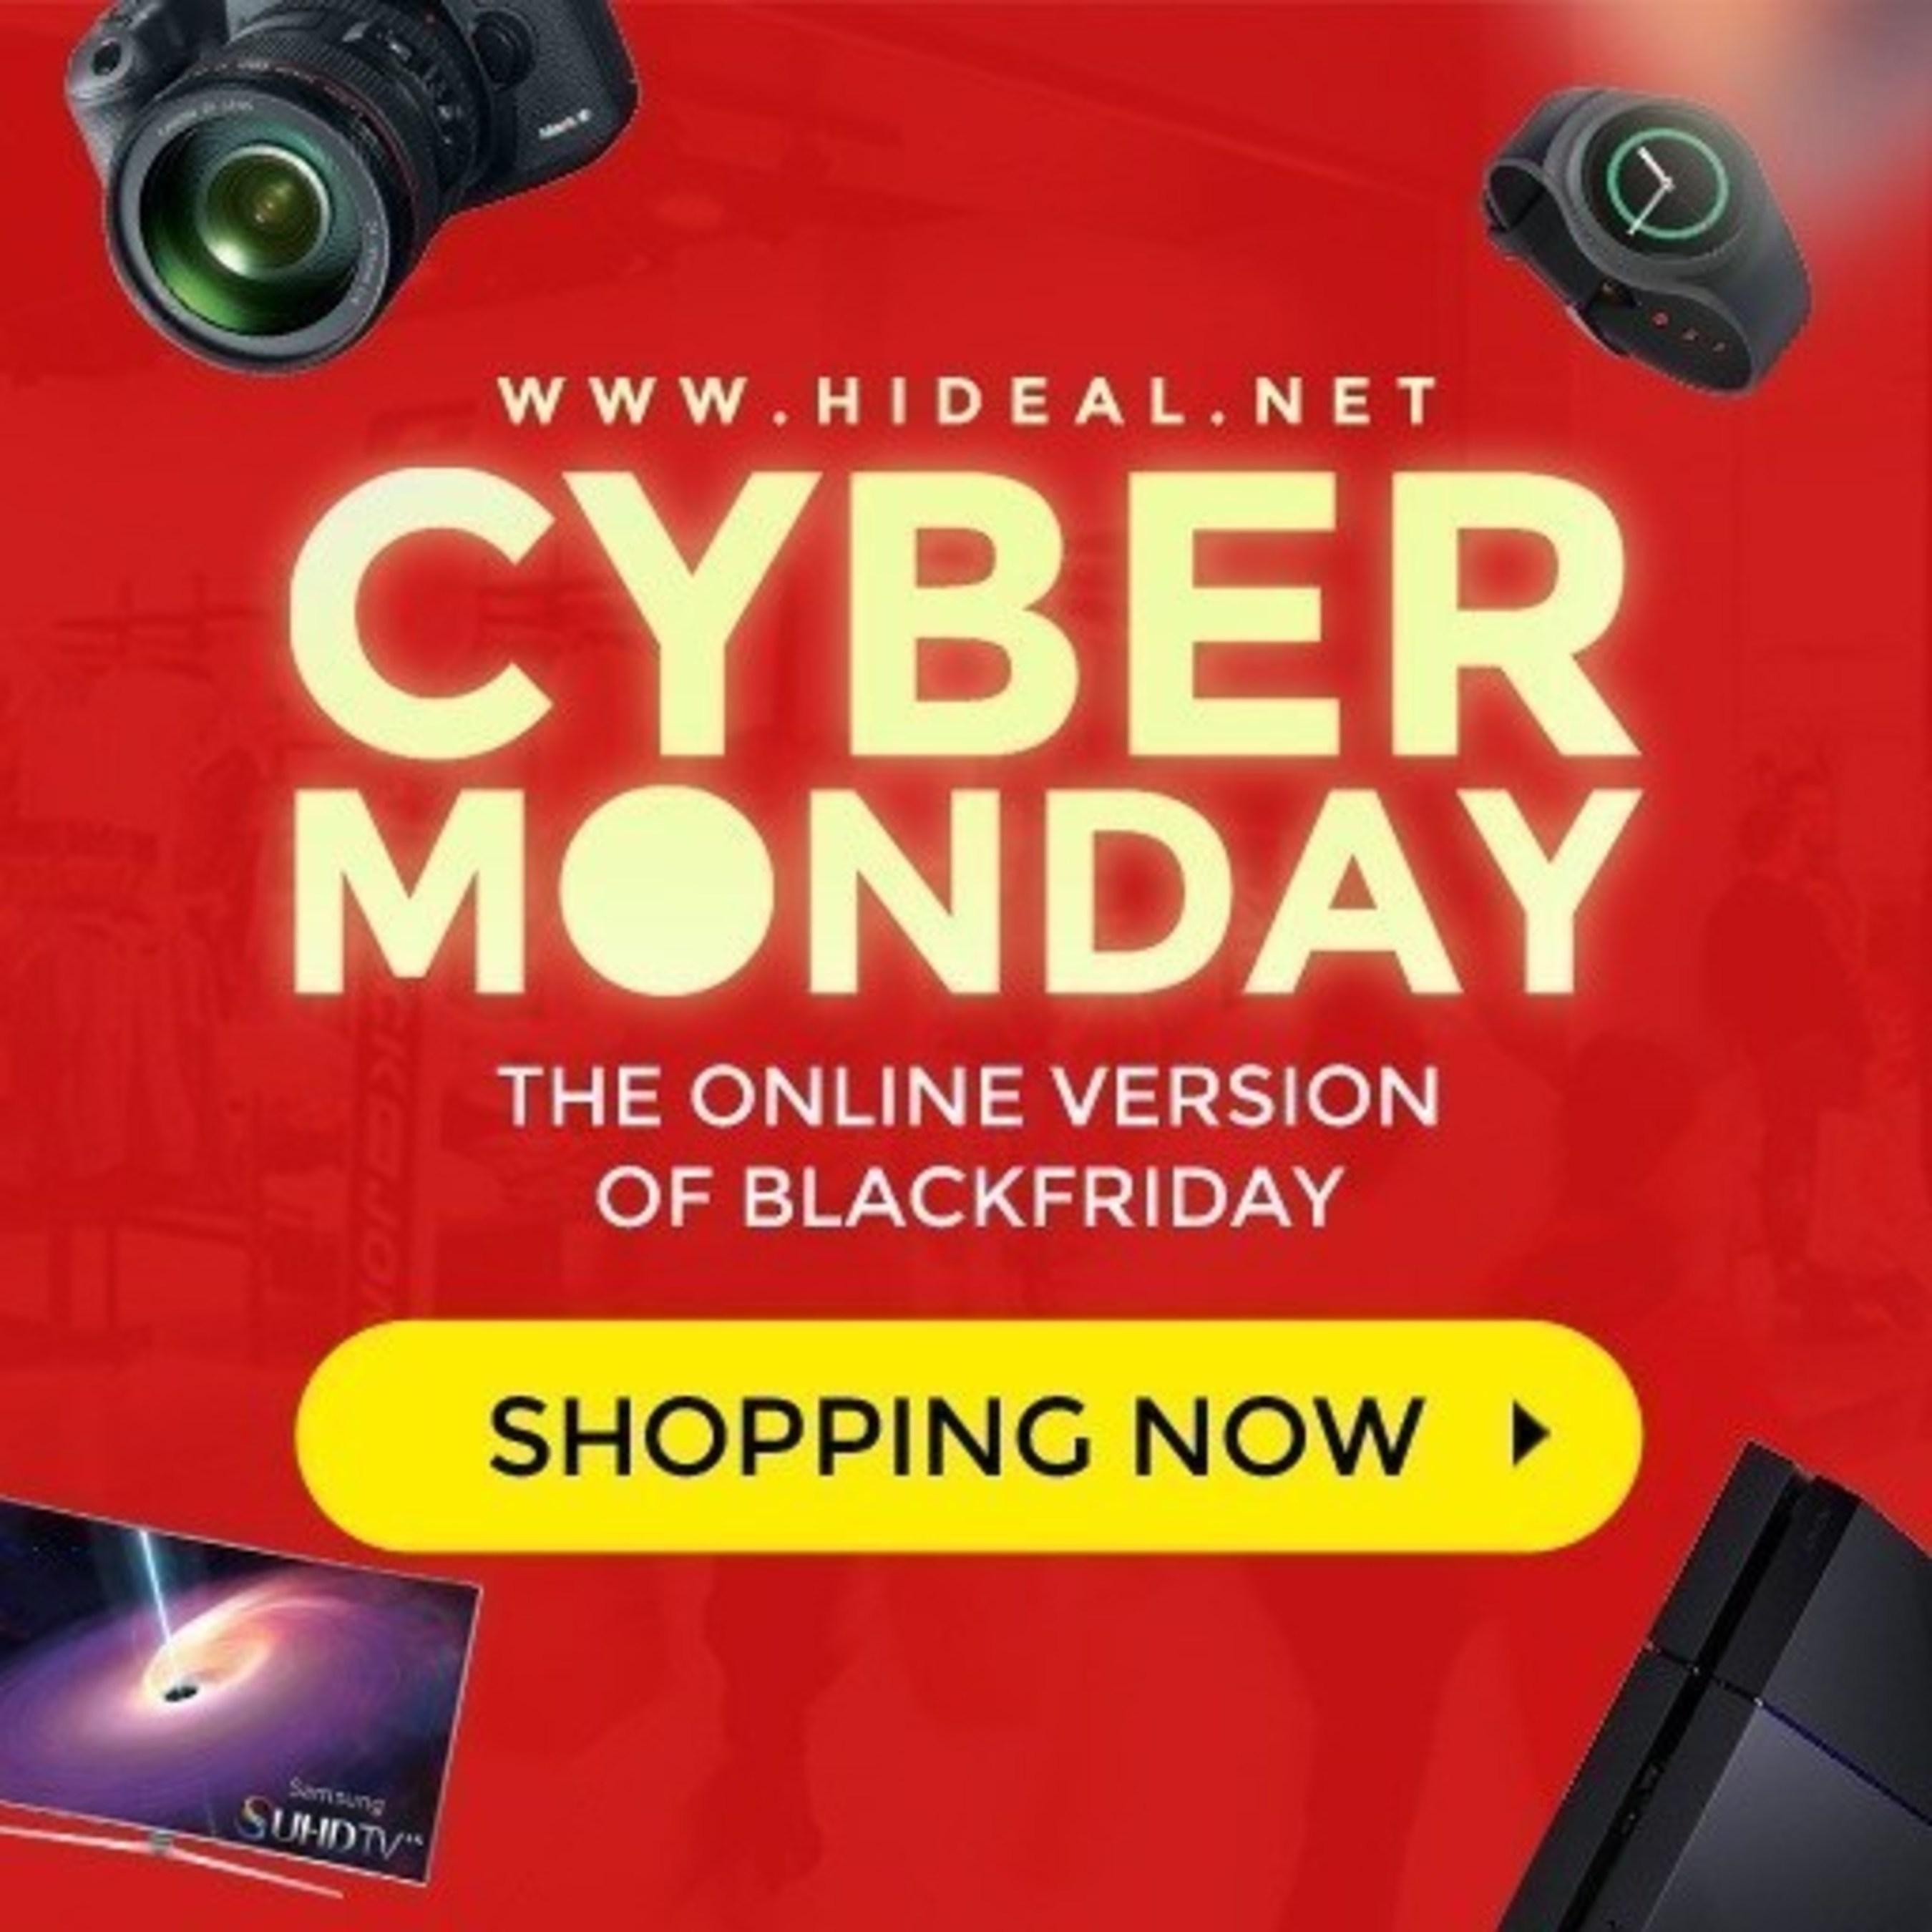 Cyber Monday Deals 2015 Power Up Savings at Hideal.net